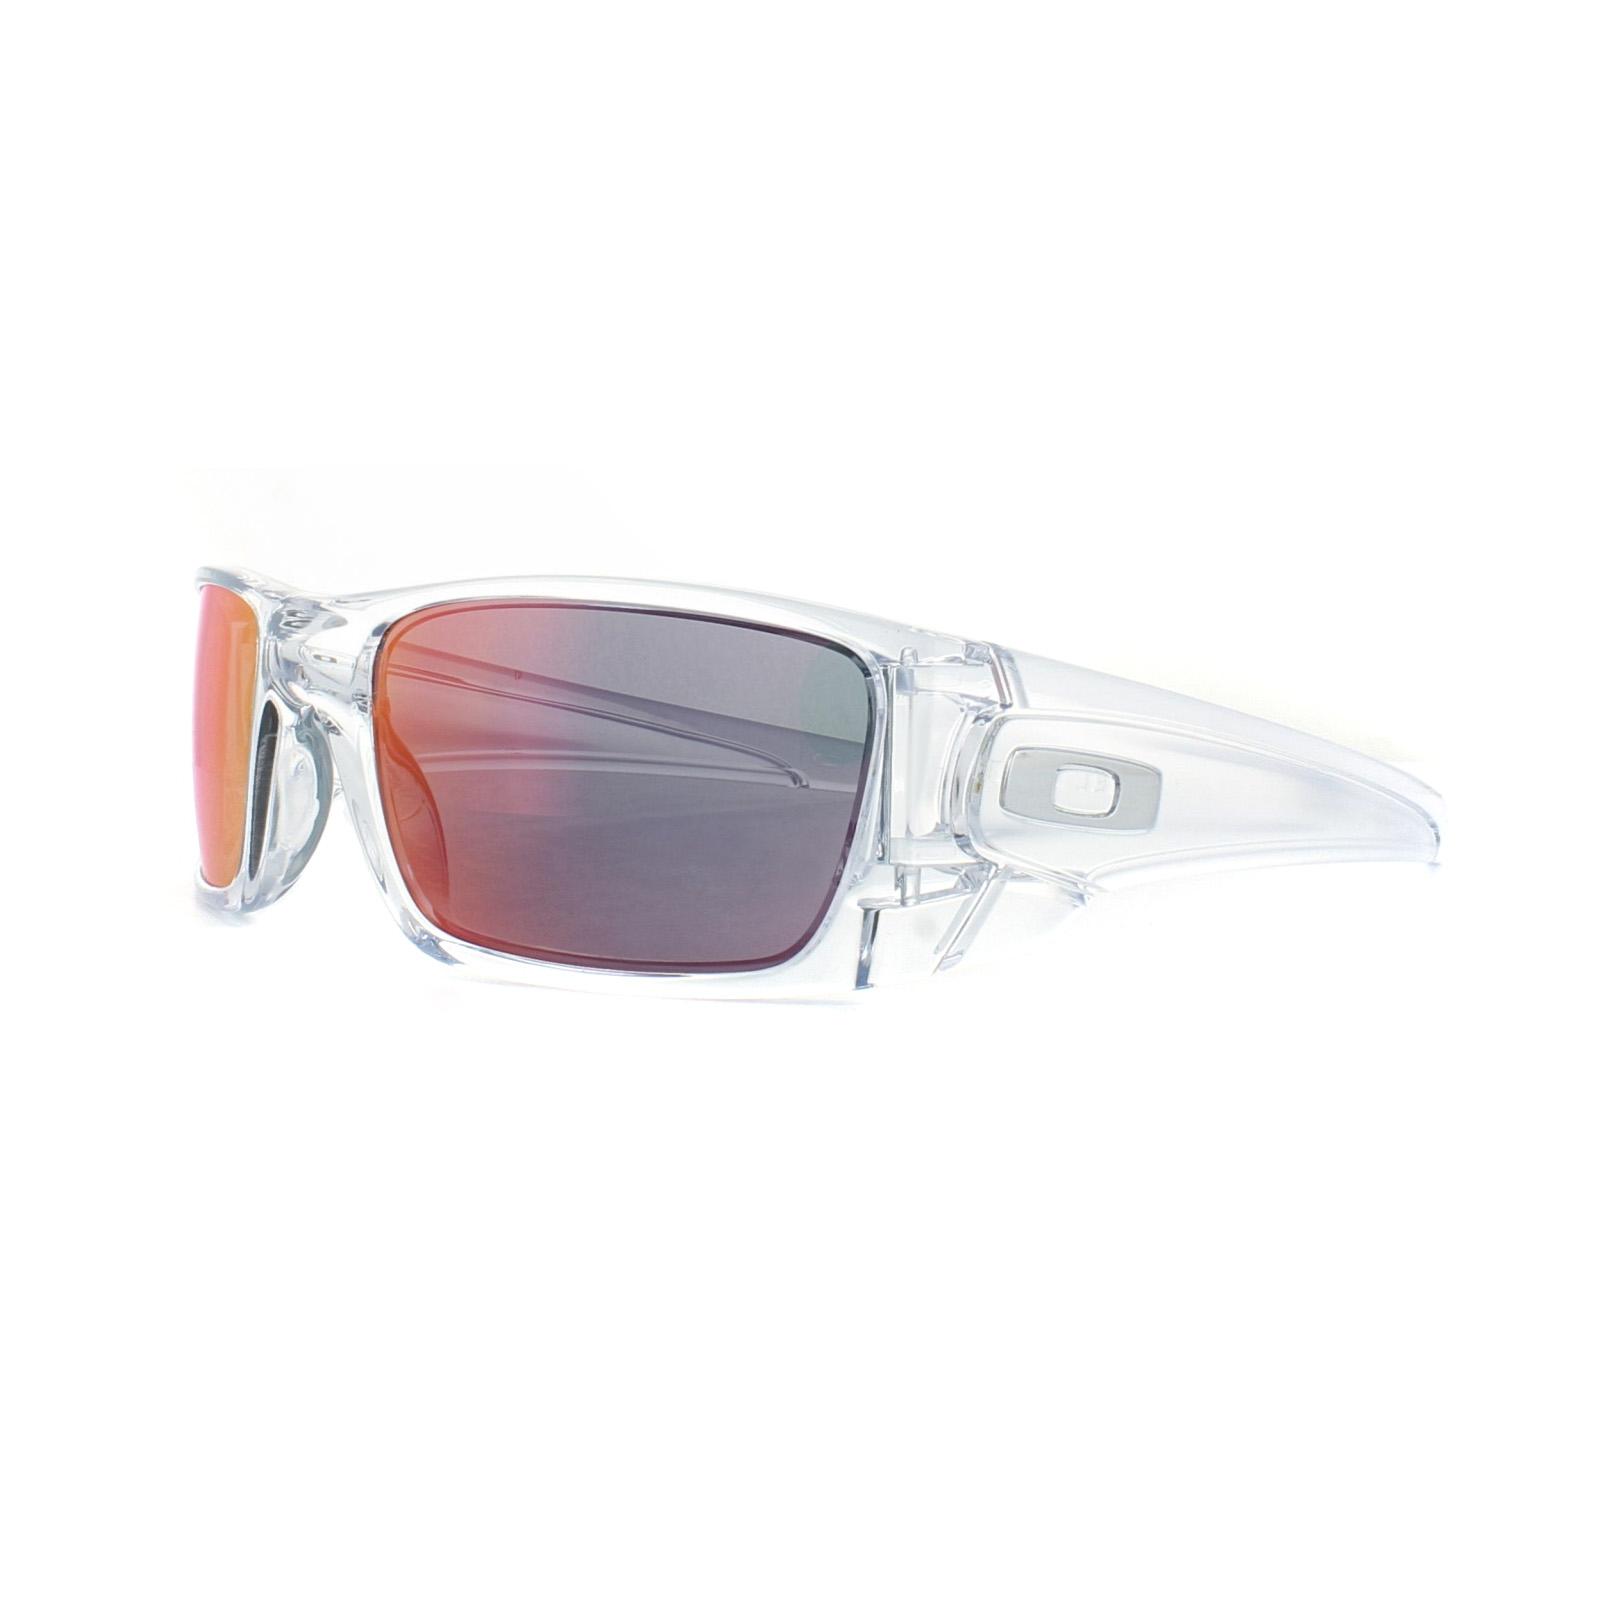 Oakley Fuel Cell Clear Torch Iridium Sonnenbrille Klar oFv5R7